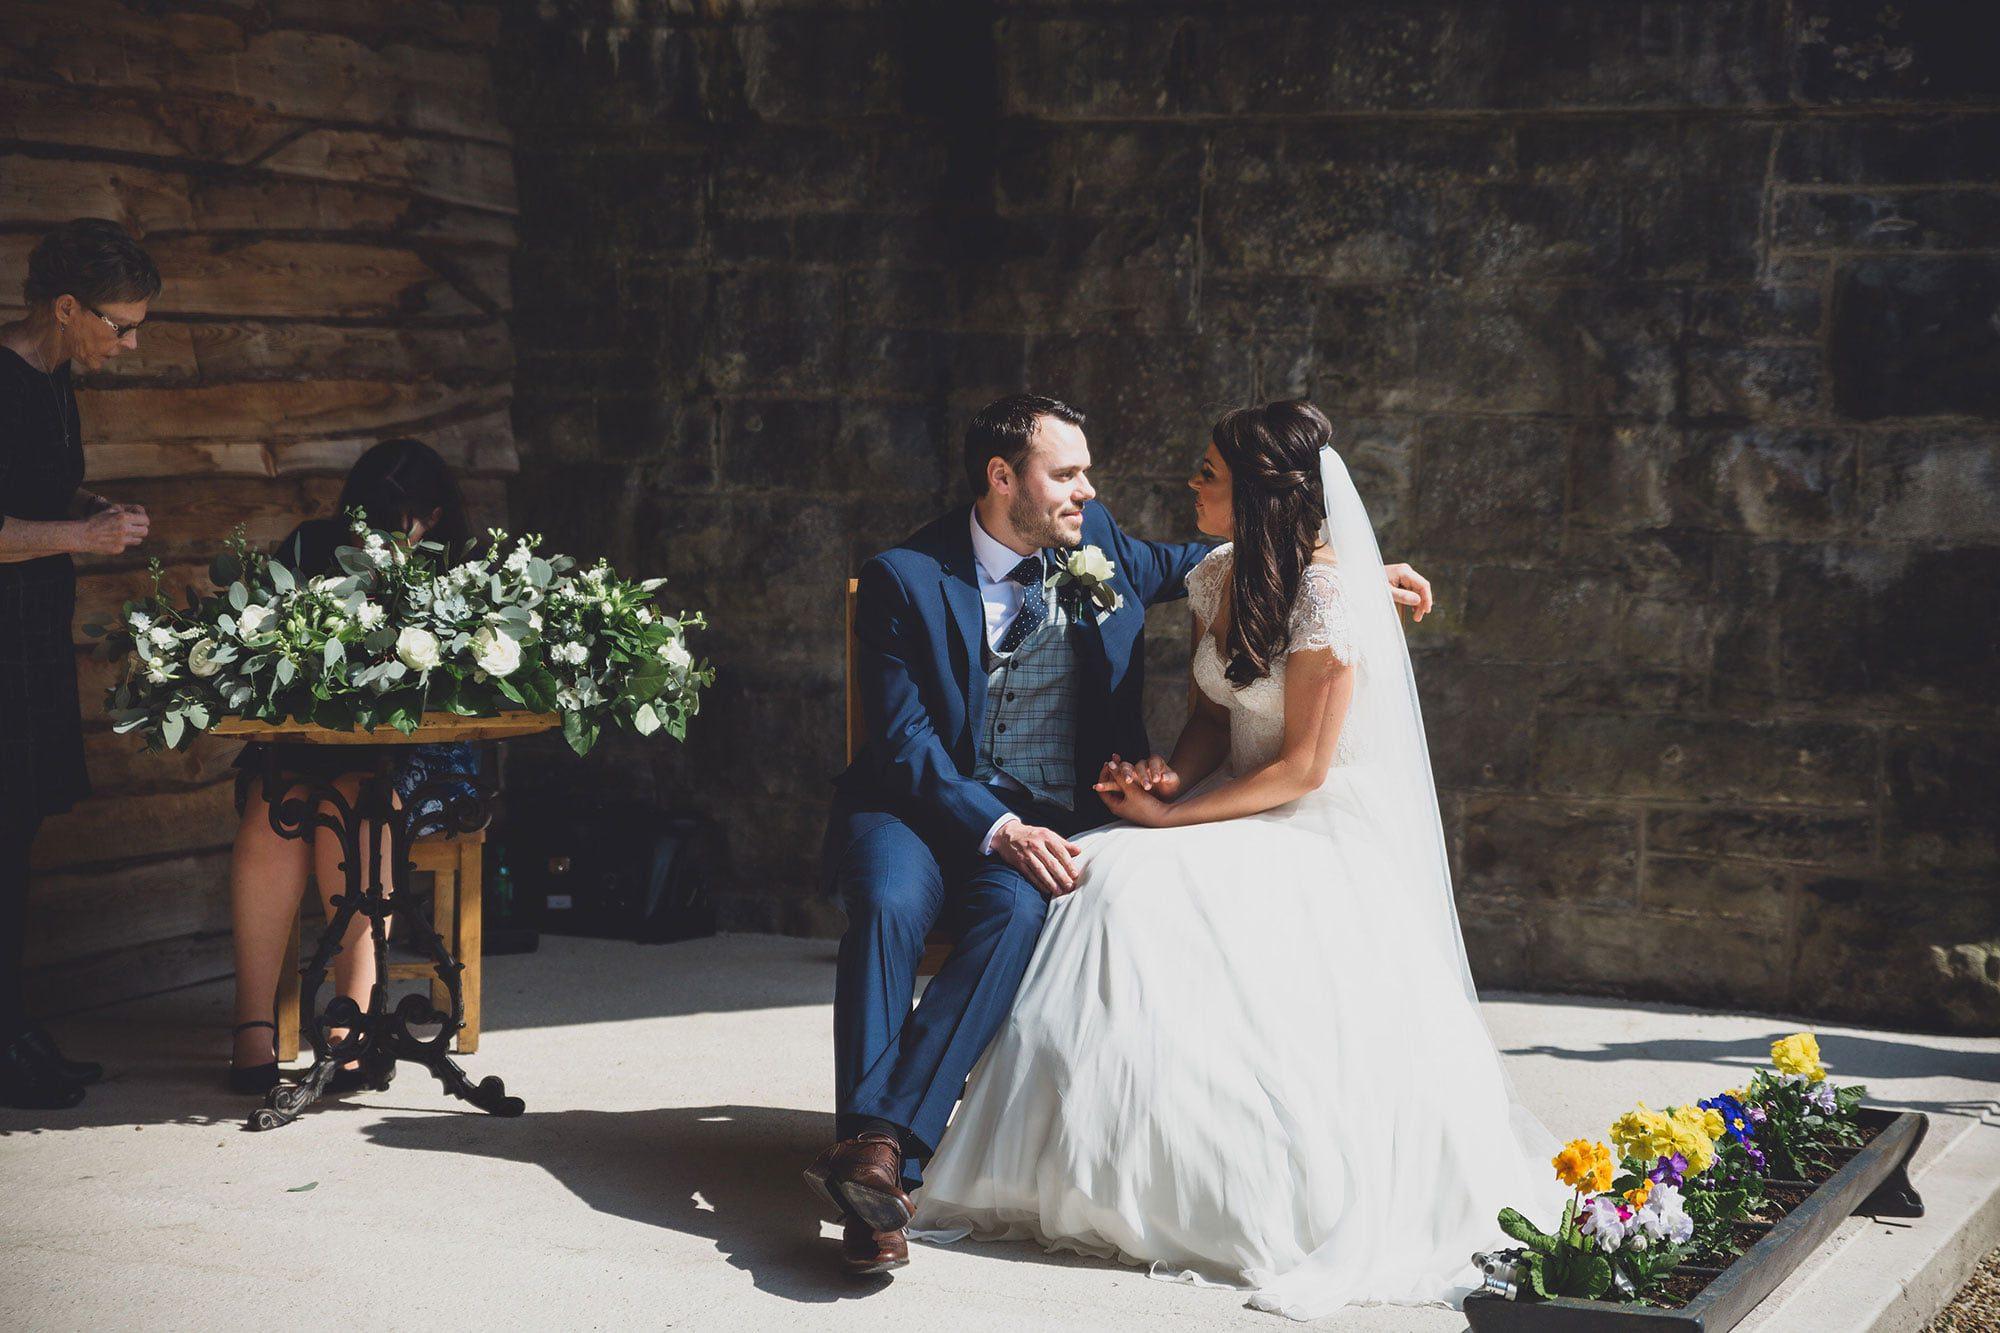 newlyweds Katherine & Nick sign their wedding register under the Old Railway Bridge; Tower Hill Barns